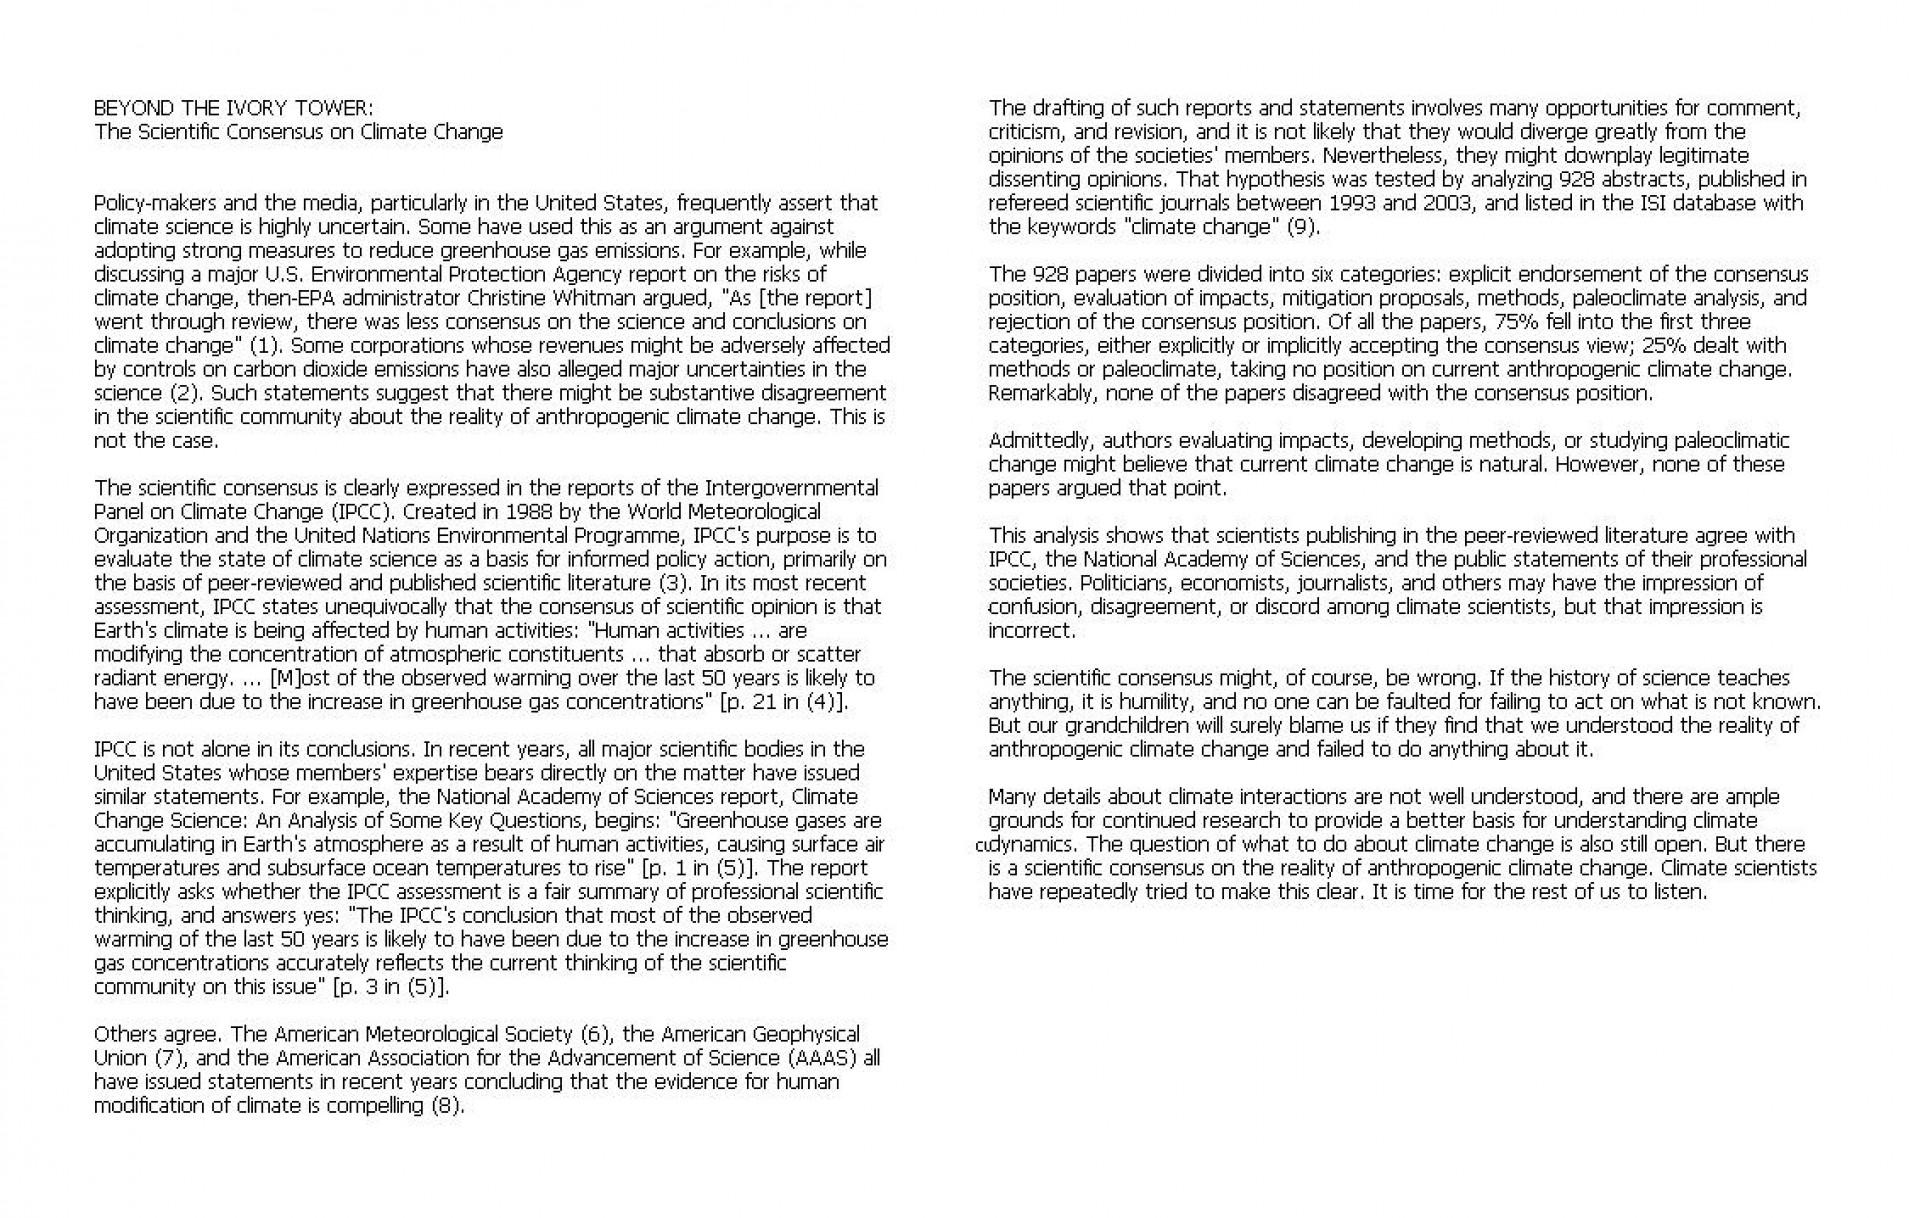 012 Paragraph Essay Sample Scientific Stirring 5 Example High School Pdf Argumentative Outline Template Five 1920